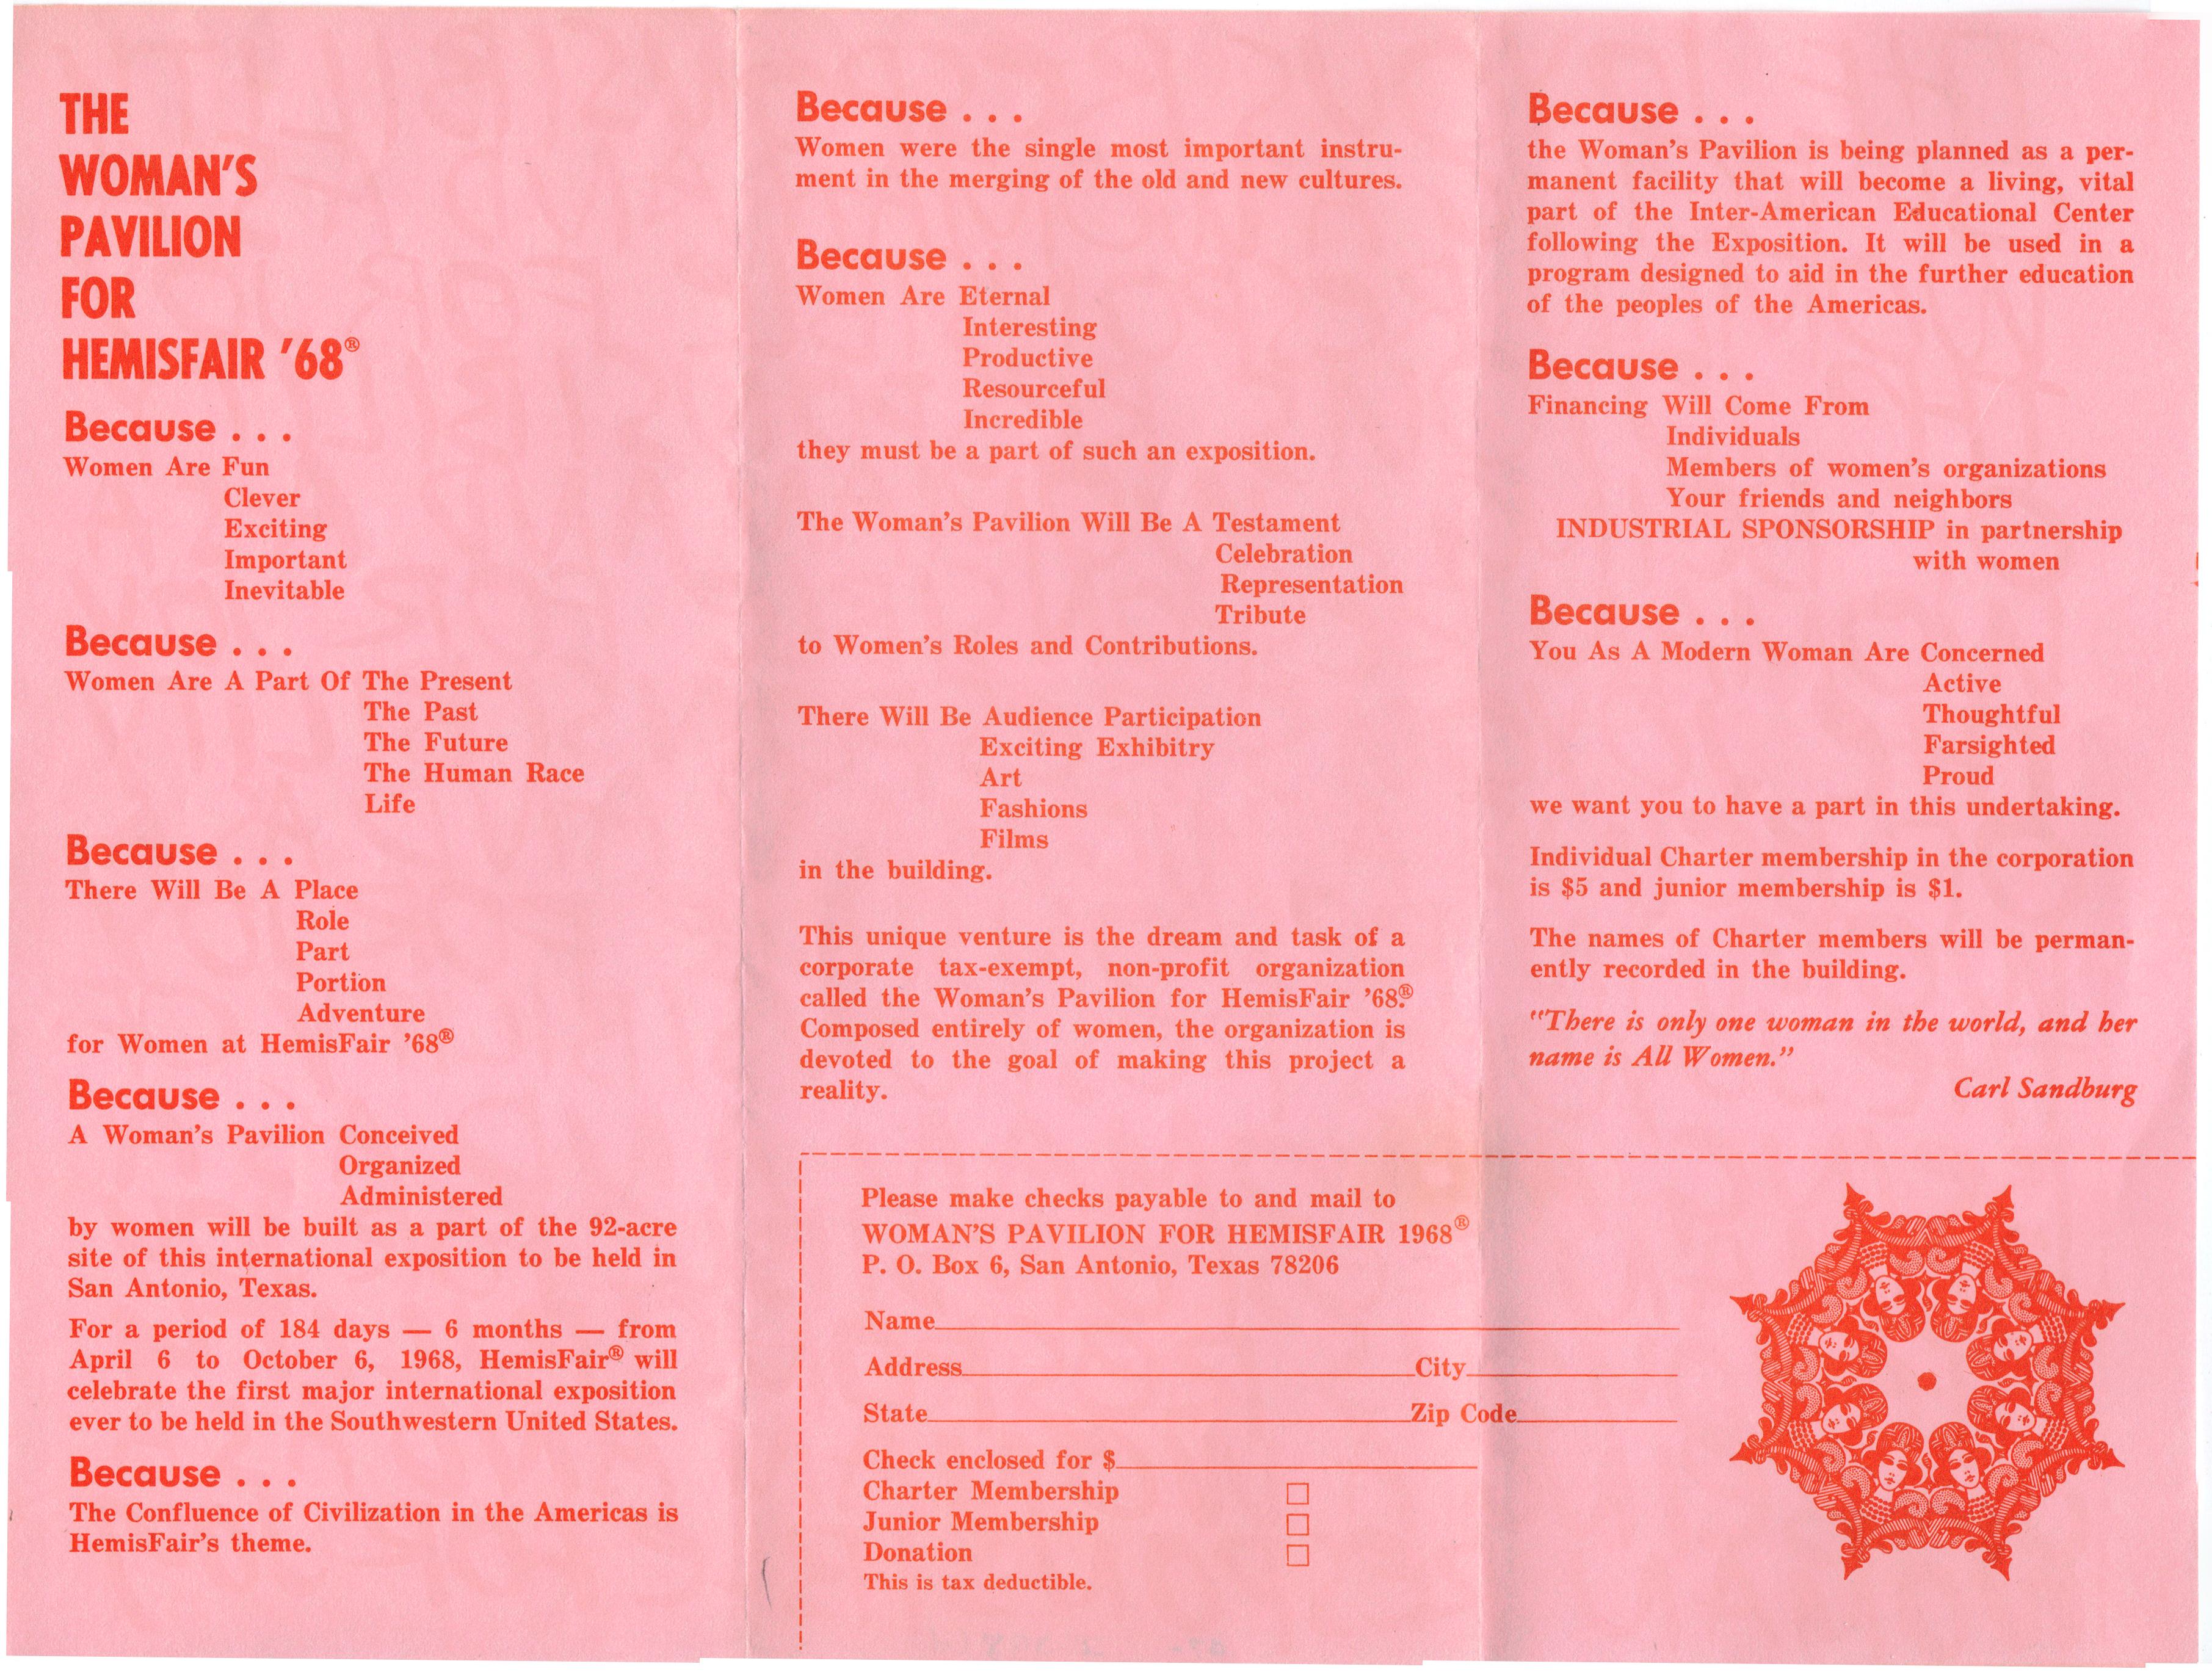 Object: Handbill (Woman's Pavilion for HemisFair '68 Brochure) | UTSA Institute Of Texan Cultures